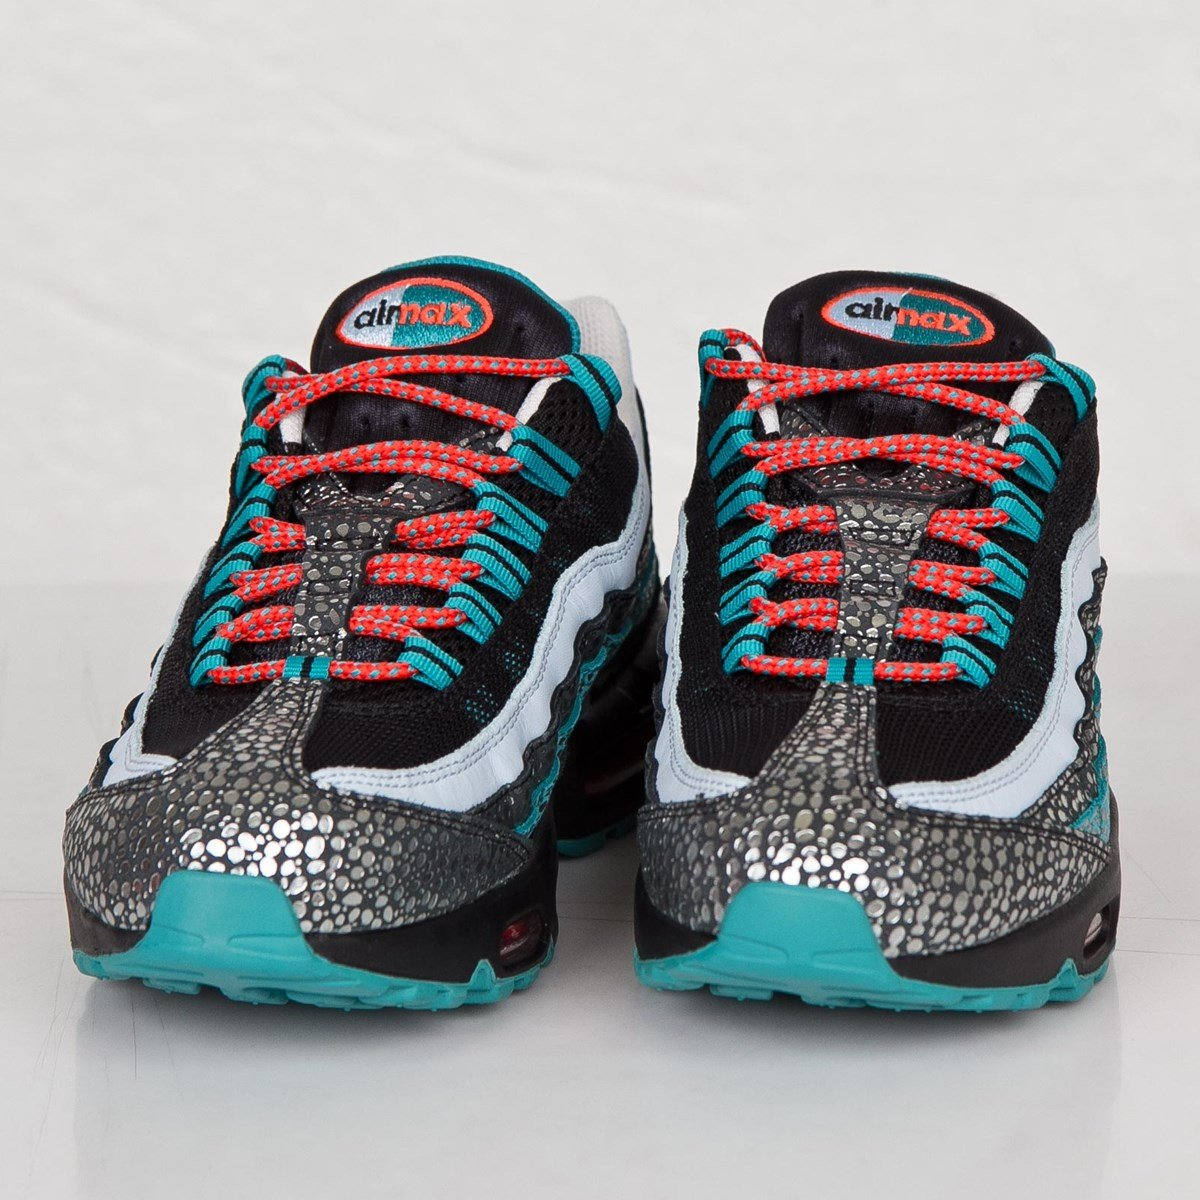 huge discount 1ee6e 2f9b4 Nike Air Max 95 Deluxe QS - 728475-001 - Sneakersnstuff   sneakers    streetwear online since 1999